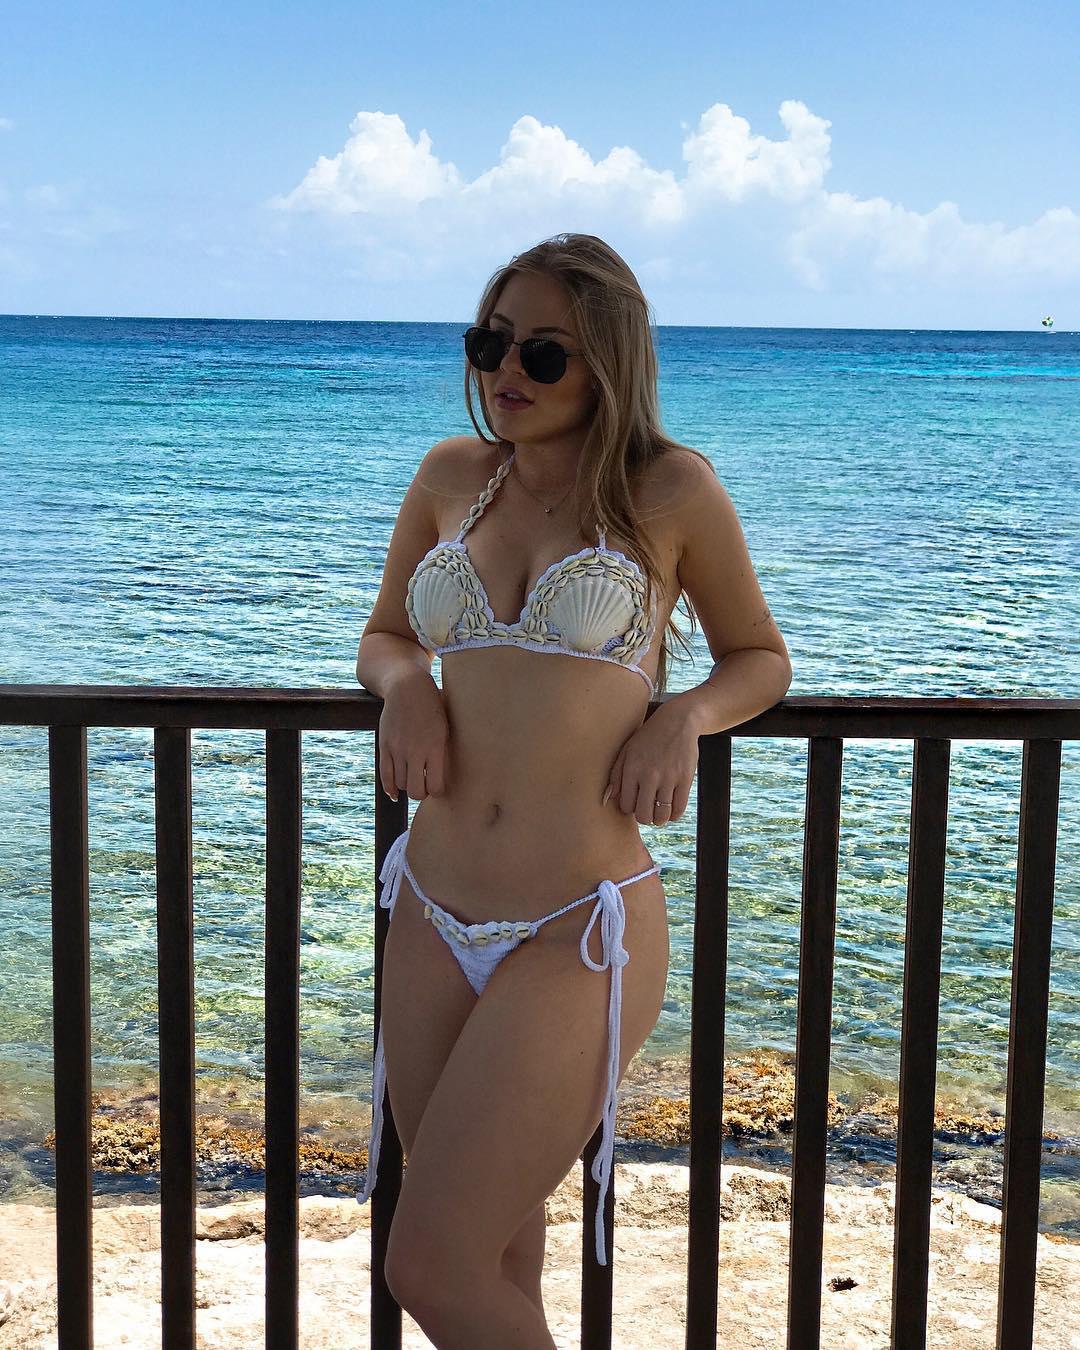 As fotos mais sexy de Luísa Sonza no Instagram 48